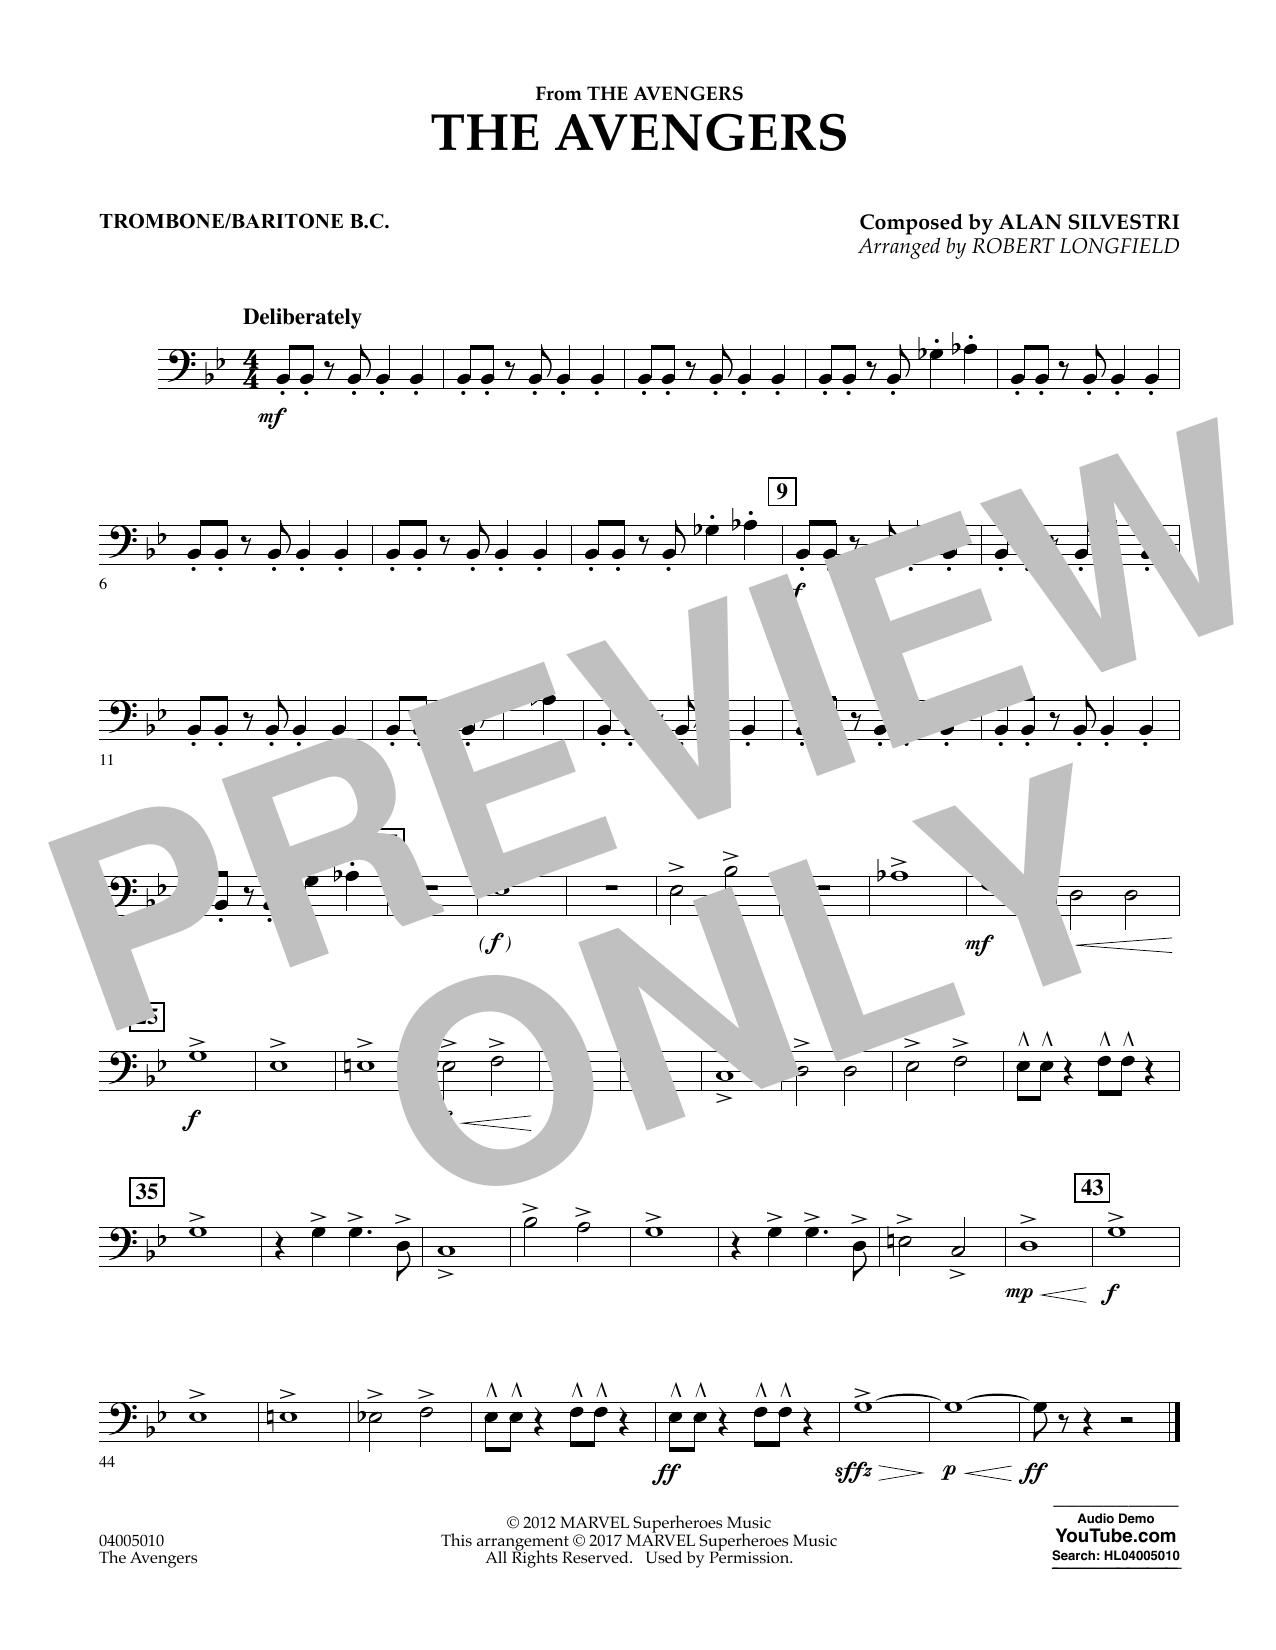 The Avengers - Trombone/Baritone B.C. Sheet Music